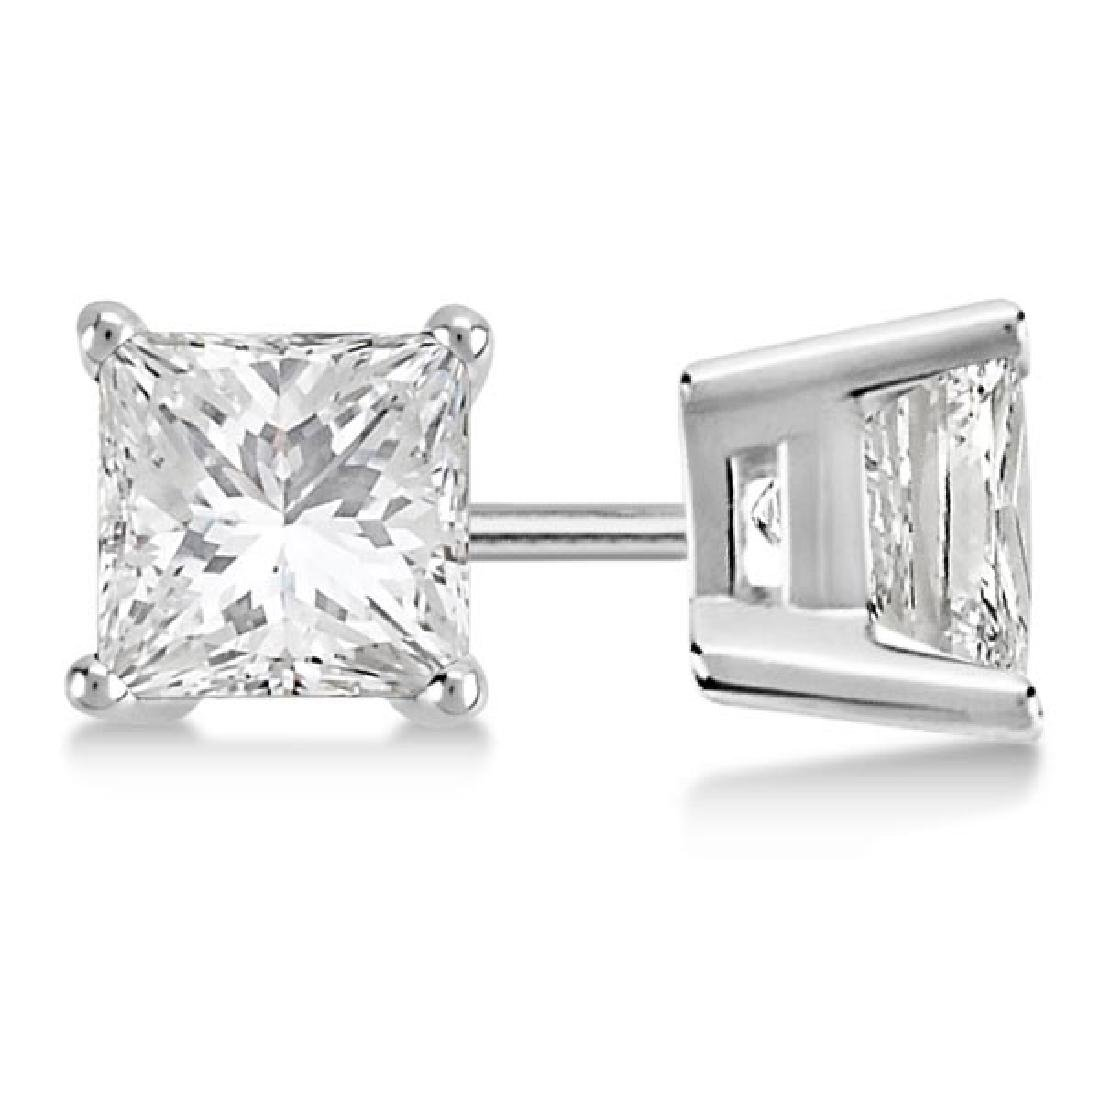 Certified 0.41 CTW Princess Diamond Stud Earrings D/SI2